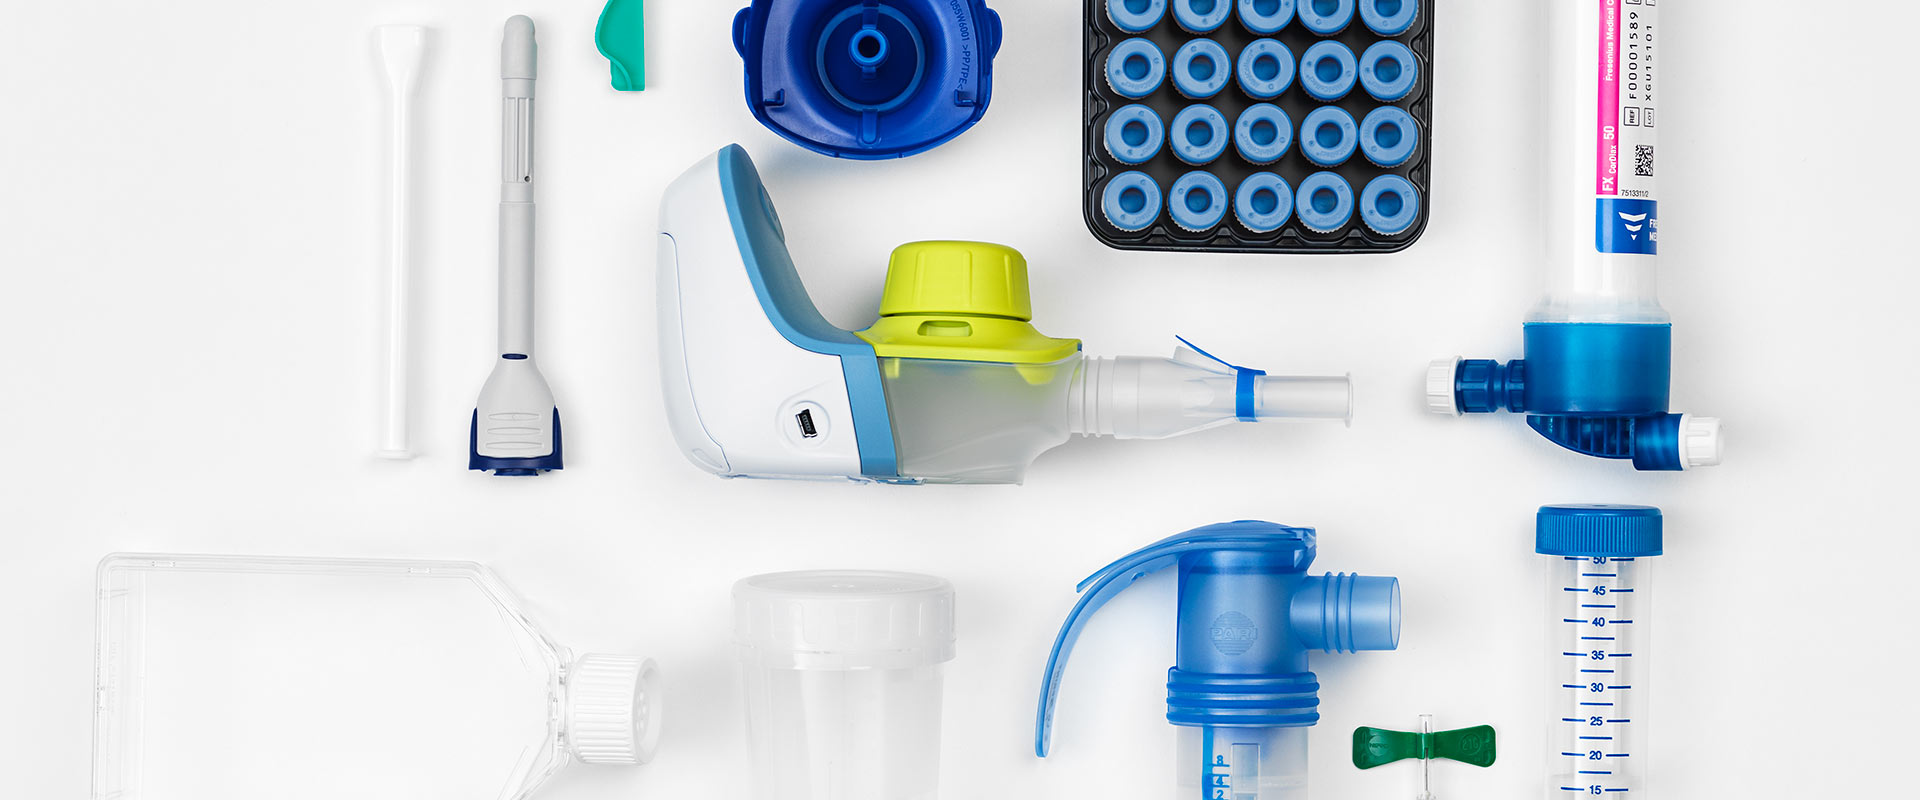 Medical Grade Plastic Machinery Suppliers | GreenTech Machinery